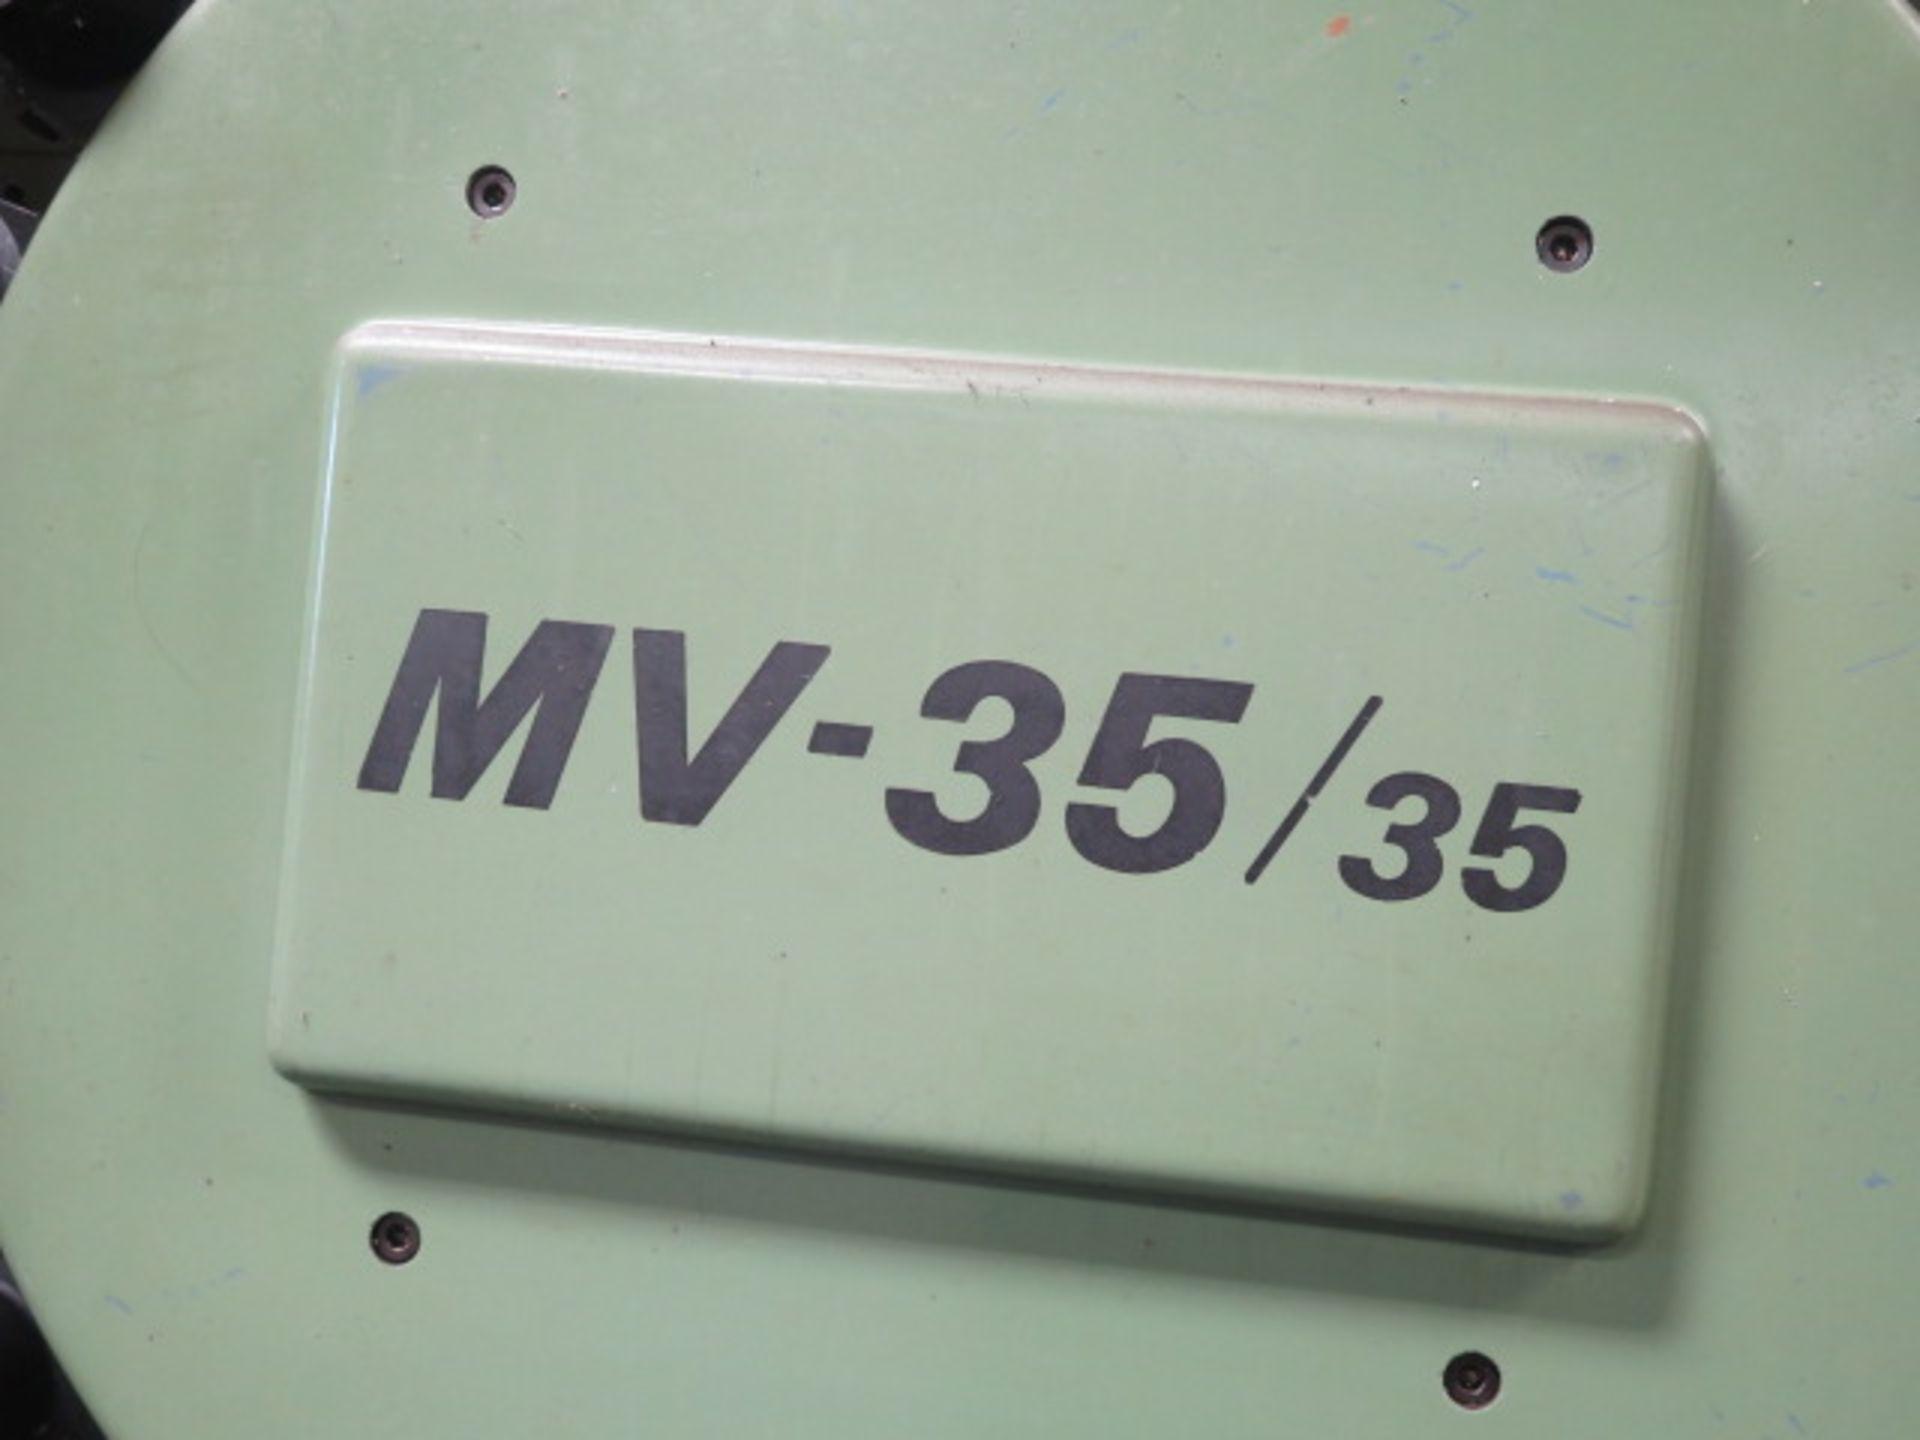 Mori Seiki MV-35/35 CNC VMC s/n 148 w/ Fanuc Controls, 20-Station ATC, BT-35, SOLD AS IS - Image 4 of 14